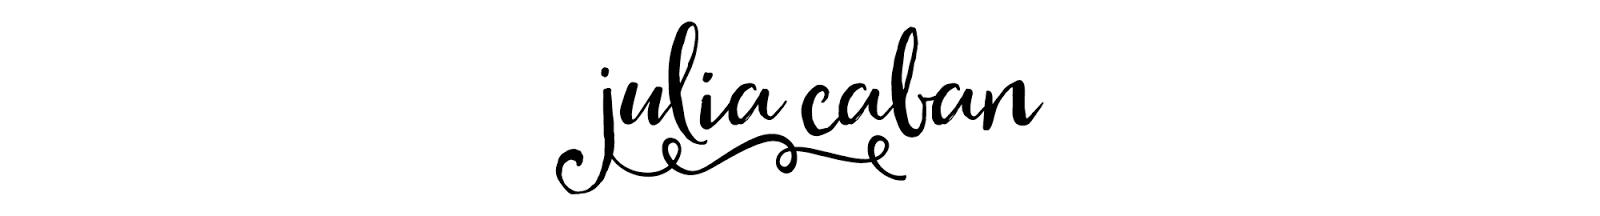 Julia Caban Blog - Uroda, Moda, Zdrowy Styl Życia (itsxjul, JULIA blog)